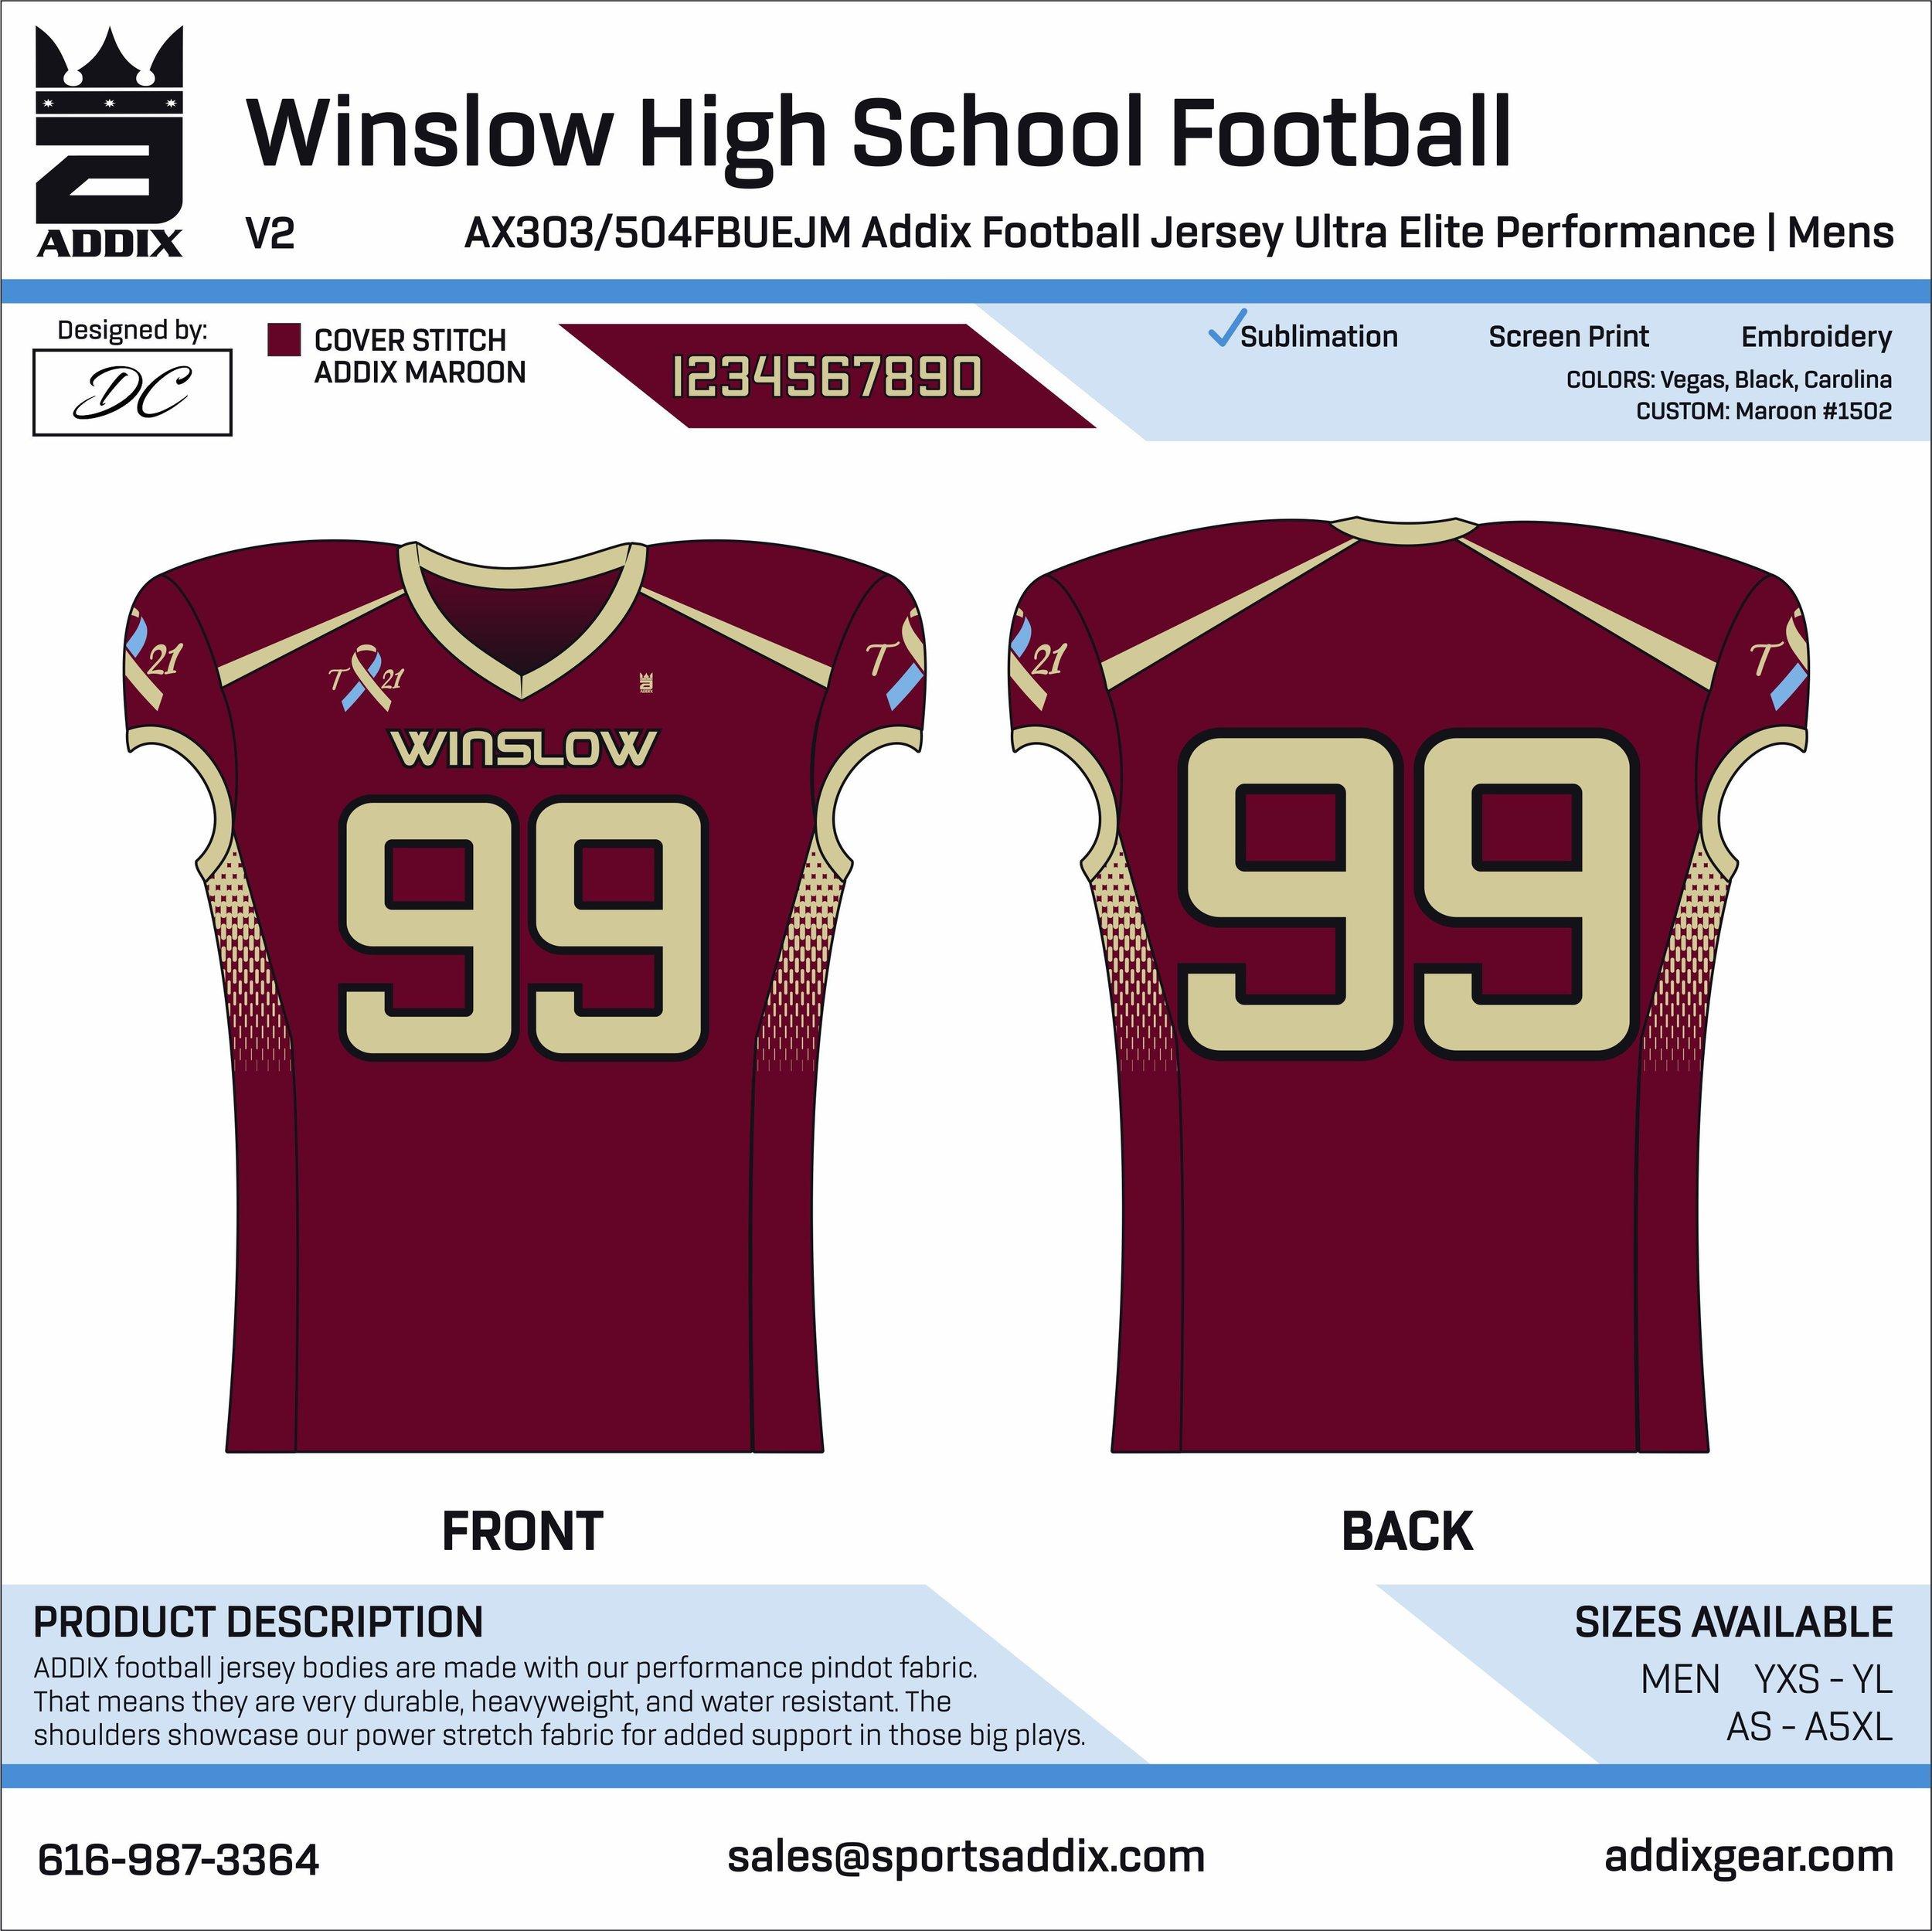 Winslow High School Football_2019_8-22_DC_UEP Jersey.jpg